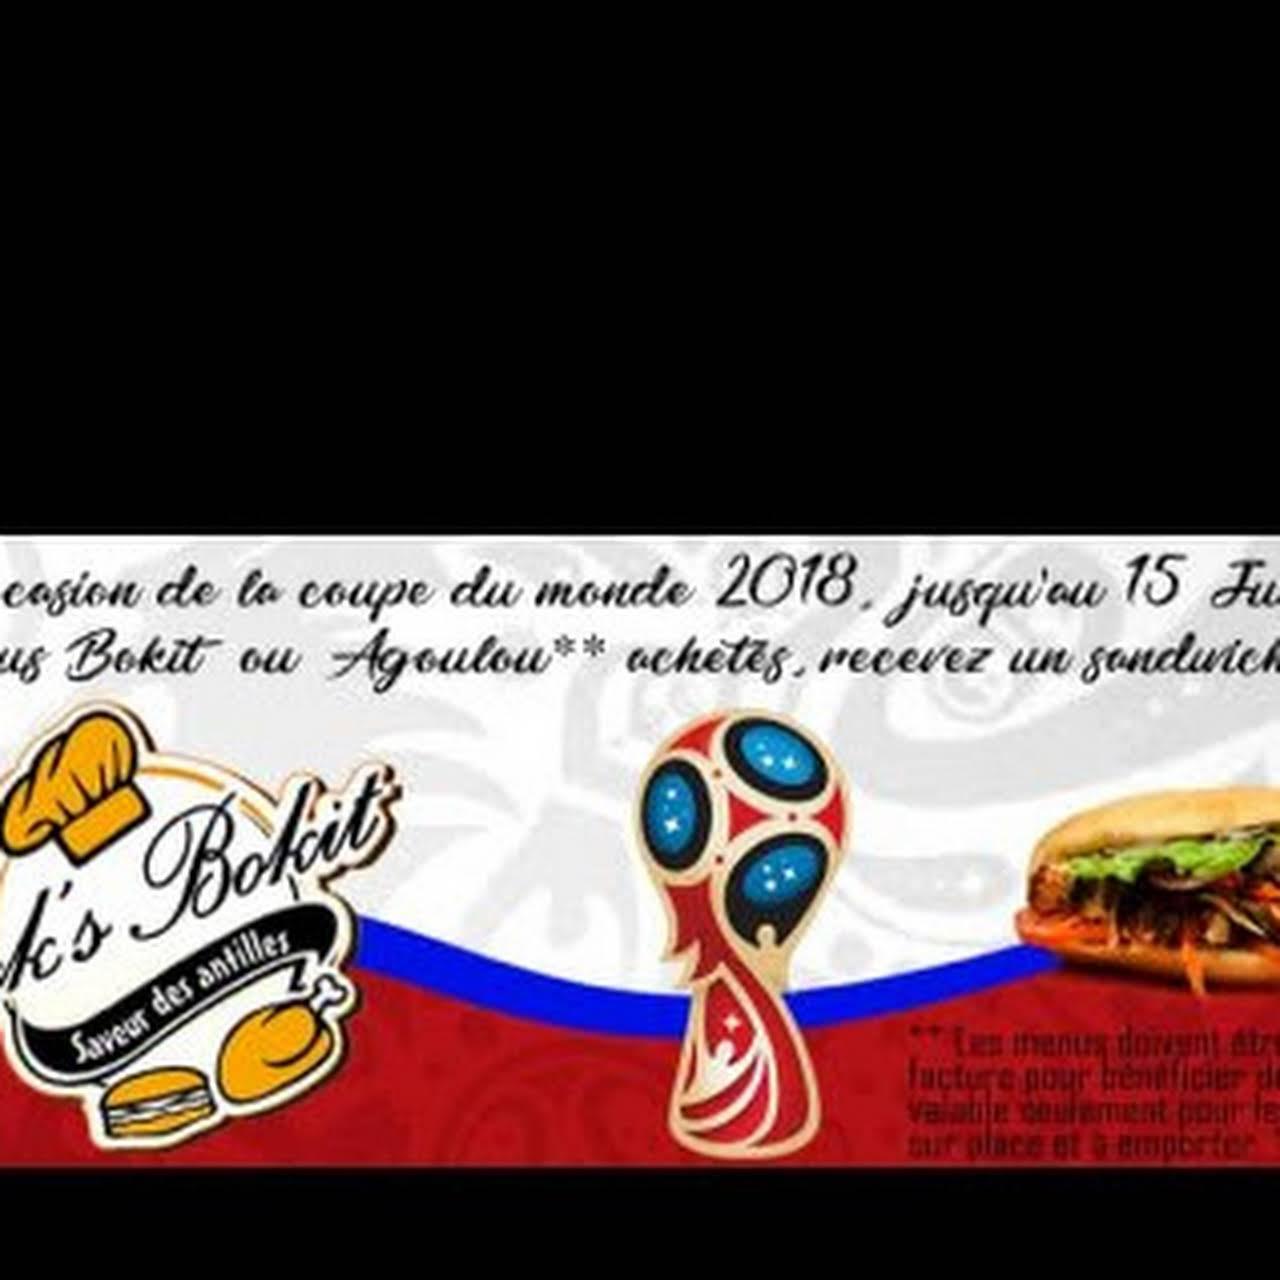 Mick S Bokit Restaurant Creole A Quincy Sous Senart